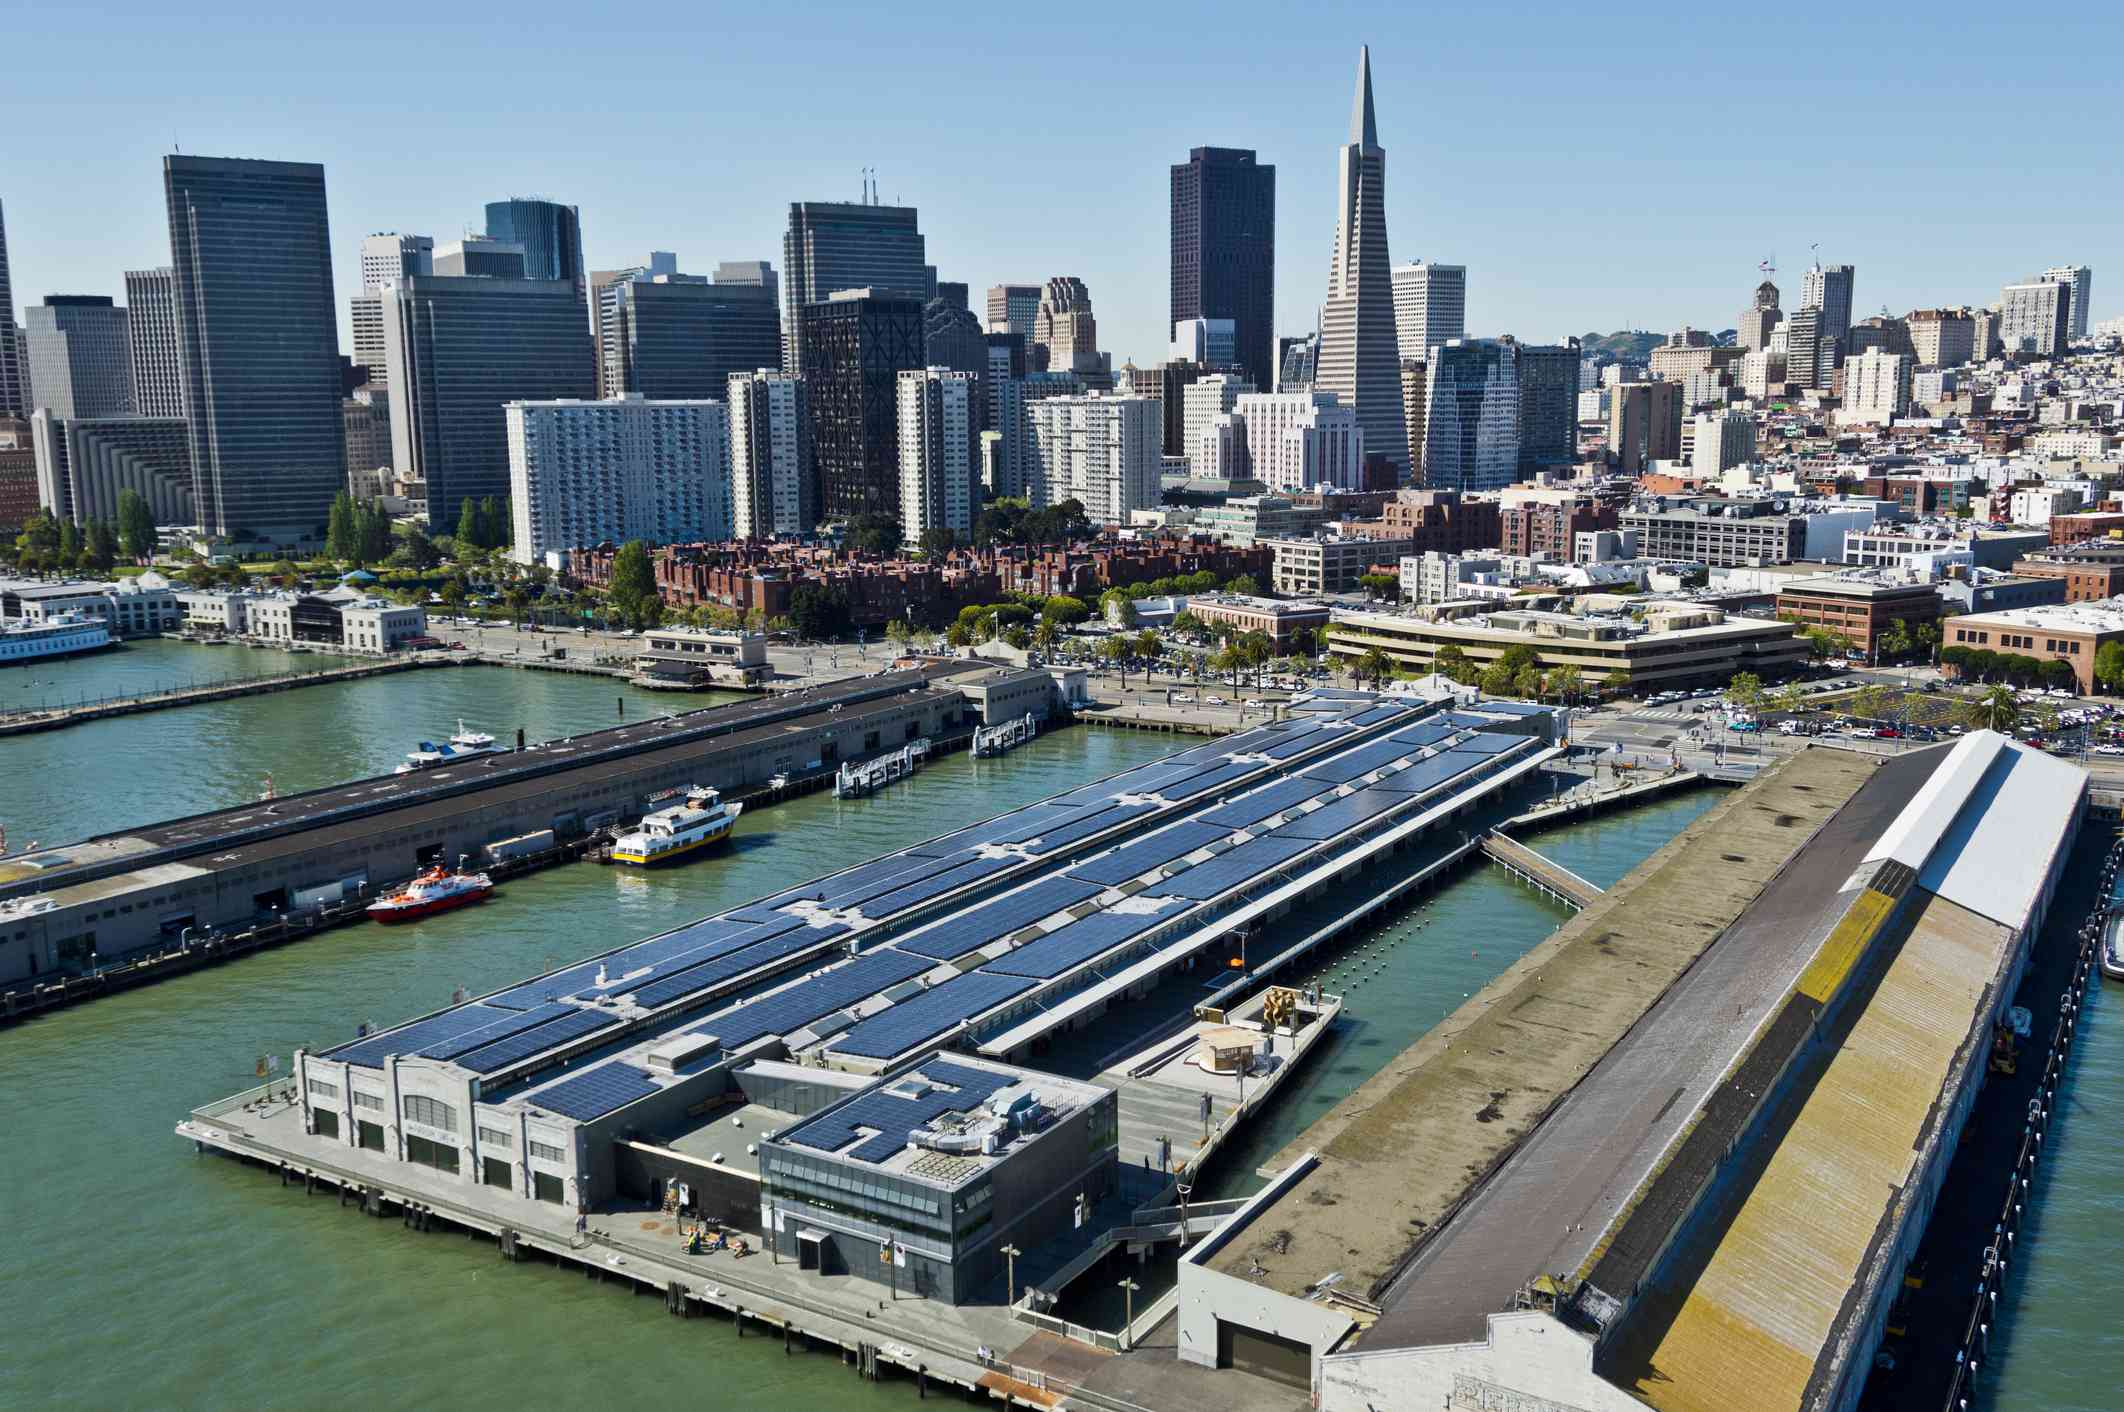 The new Exploratorium museum on the San Francisco waterfront